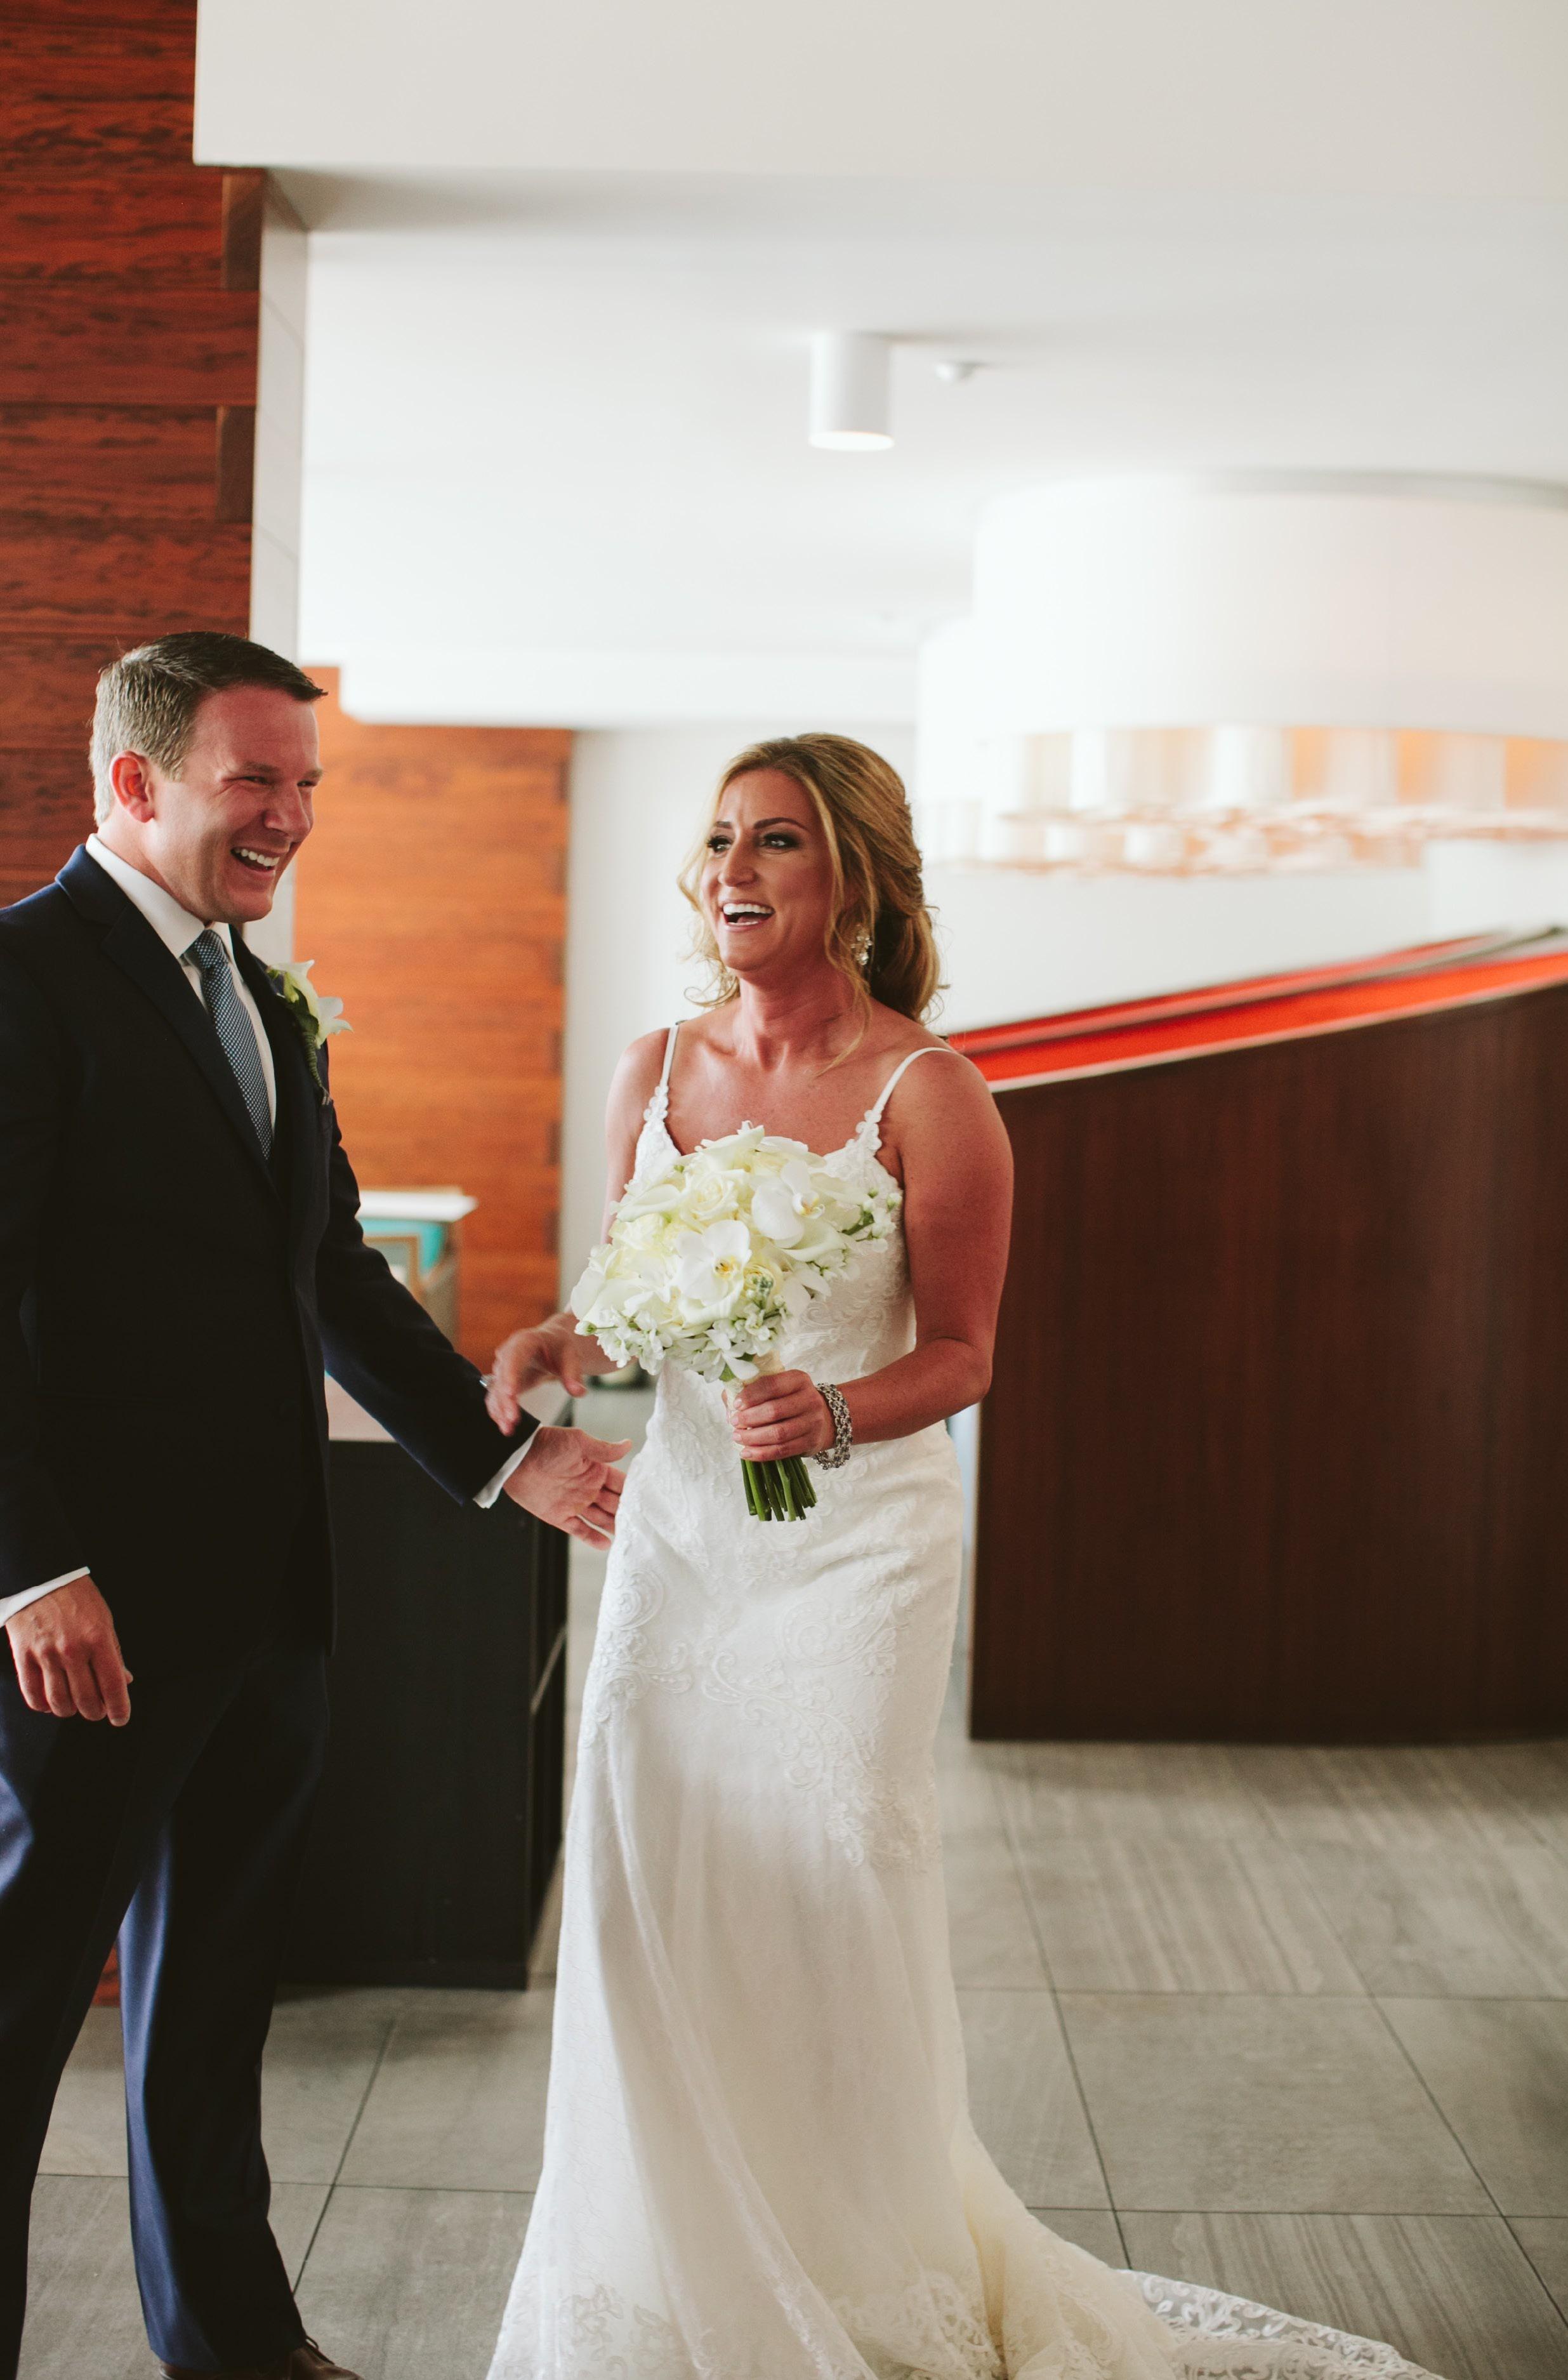 Kim + John's Wedding at the Waterstone Hotel in Boca Raton24.jpg